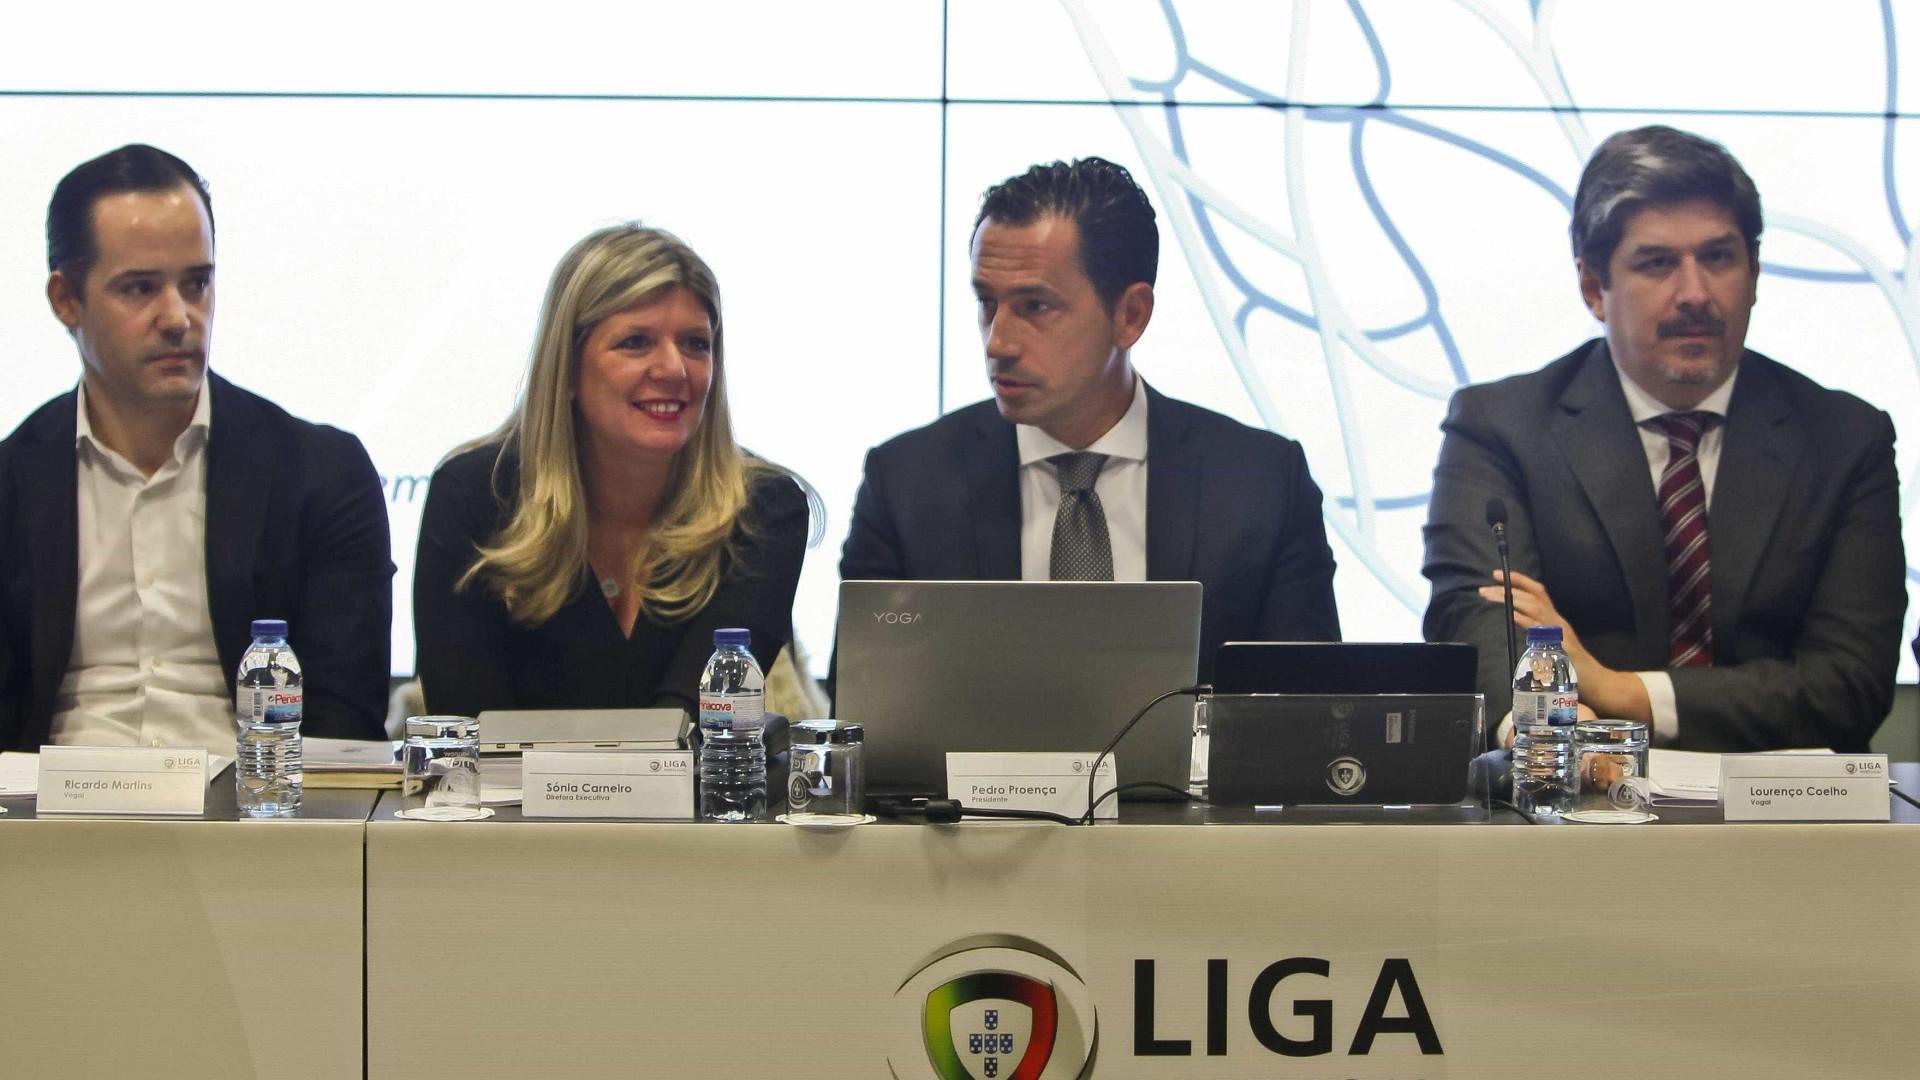 Presidente do Braga critica FC Porto e Sporting e elogia Benfica